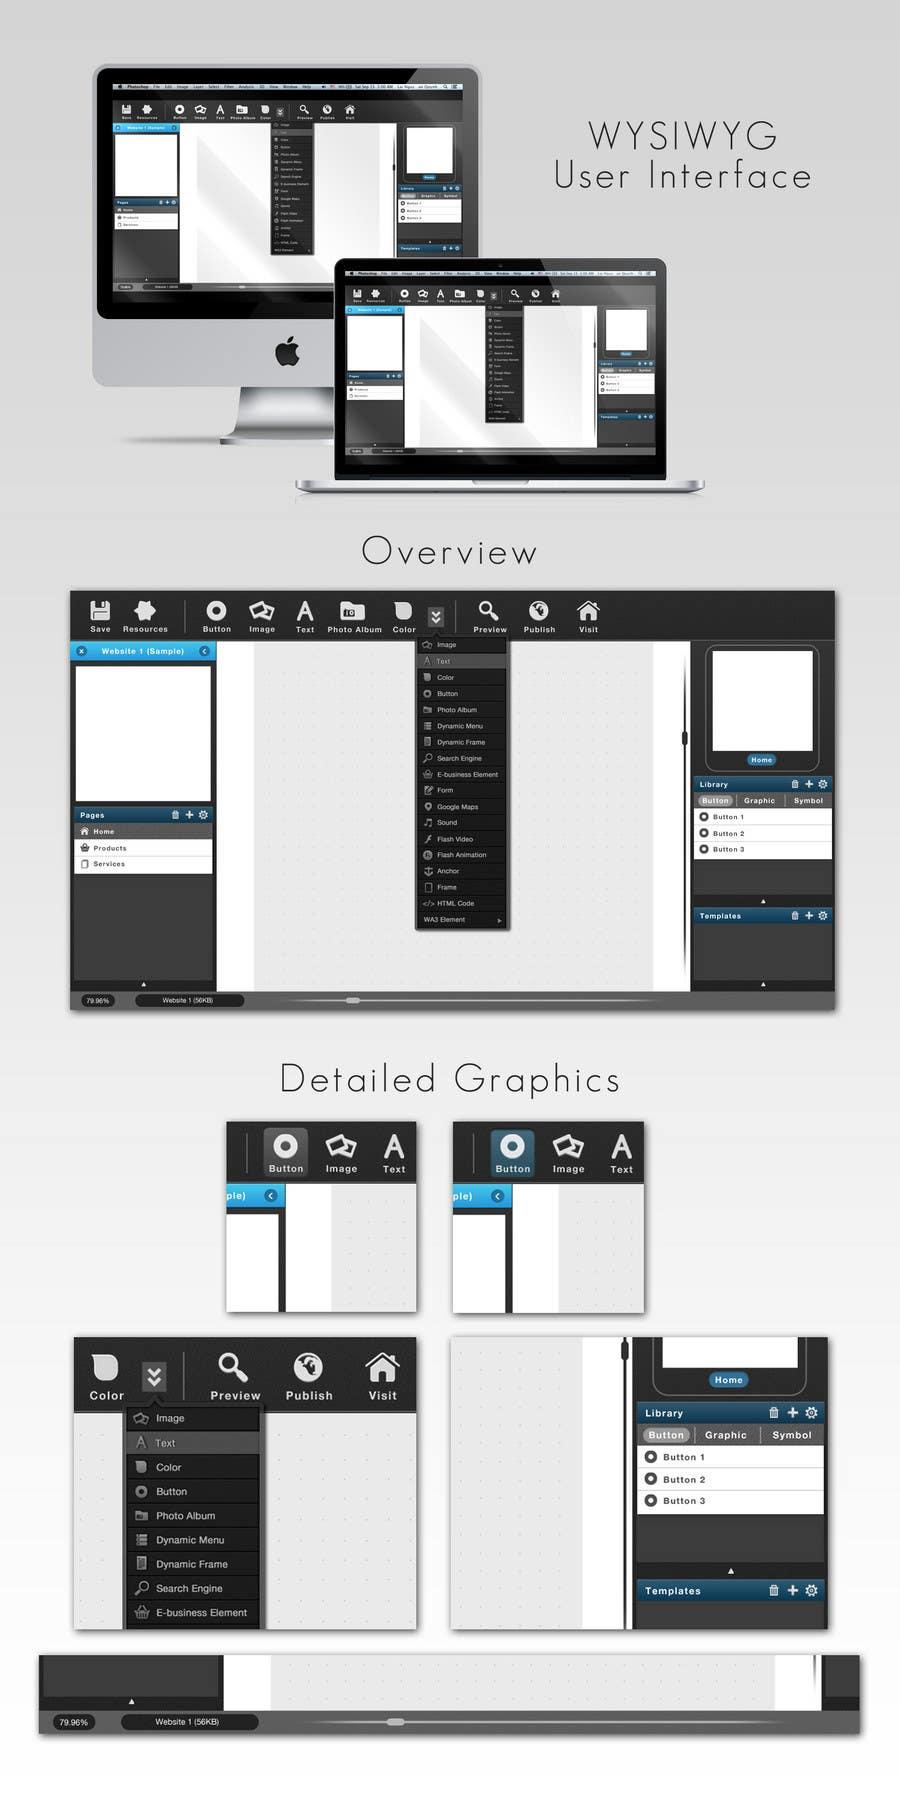 #19 for User Interface design for Website Builder Software by baoquynh132